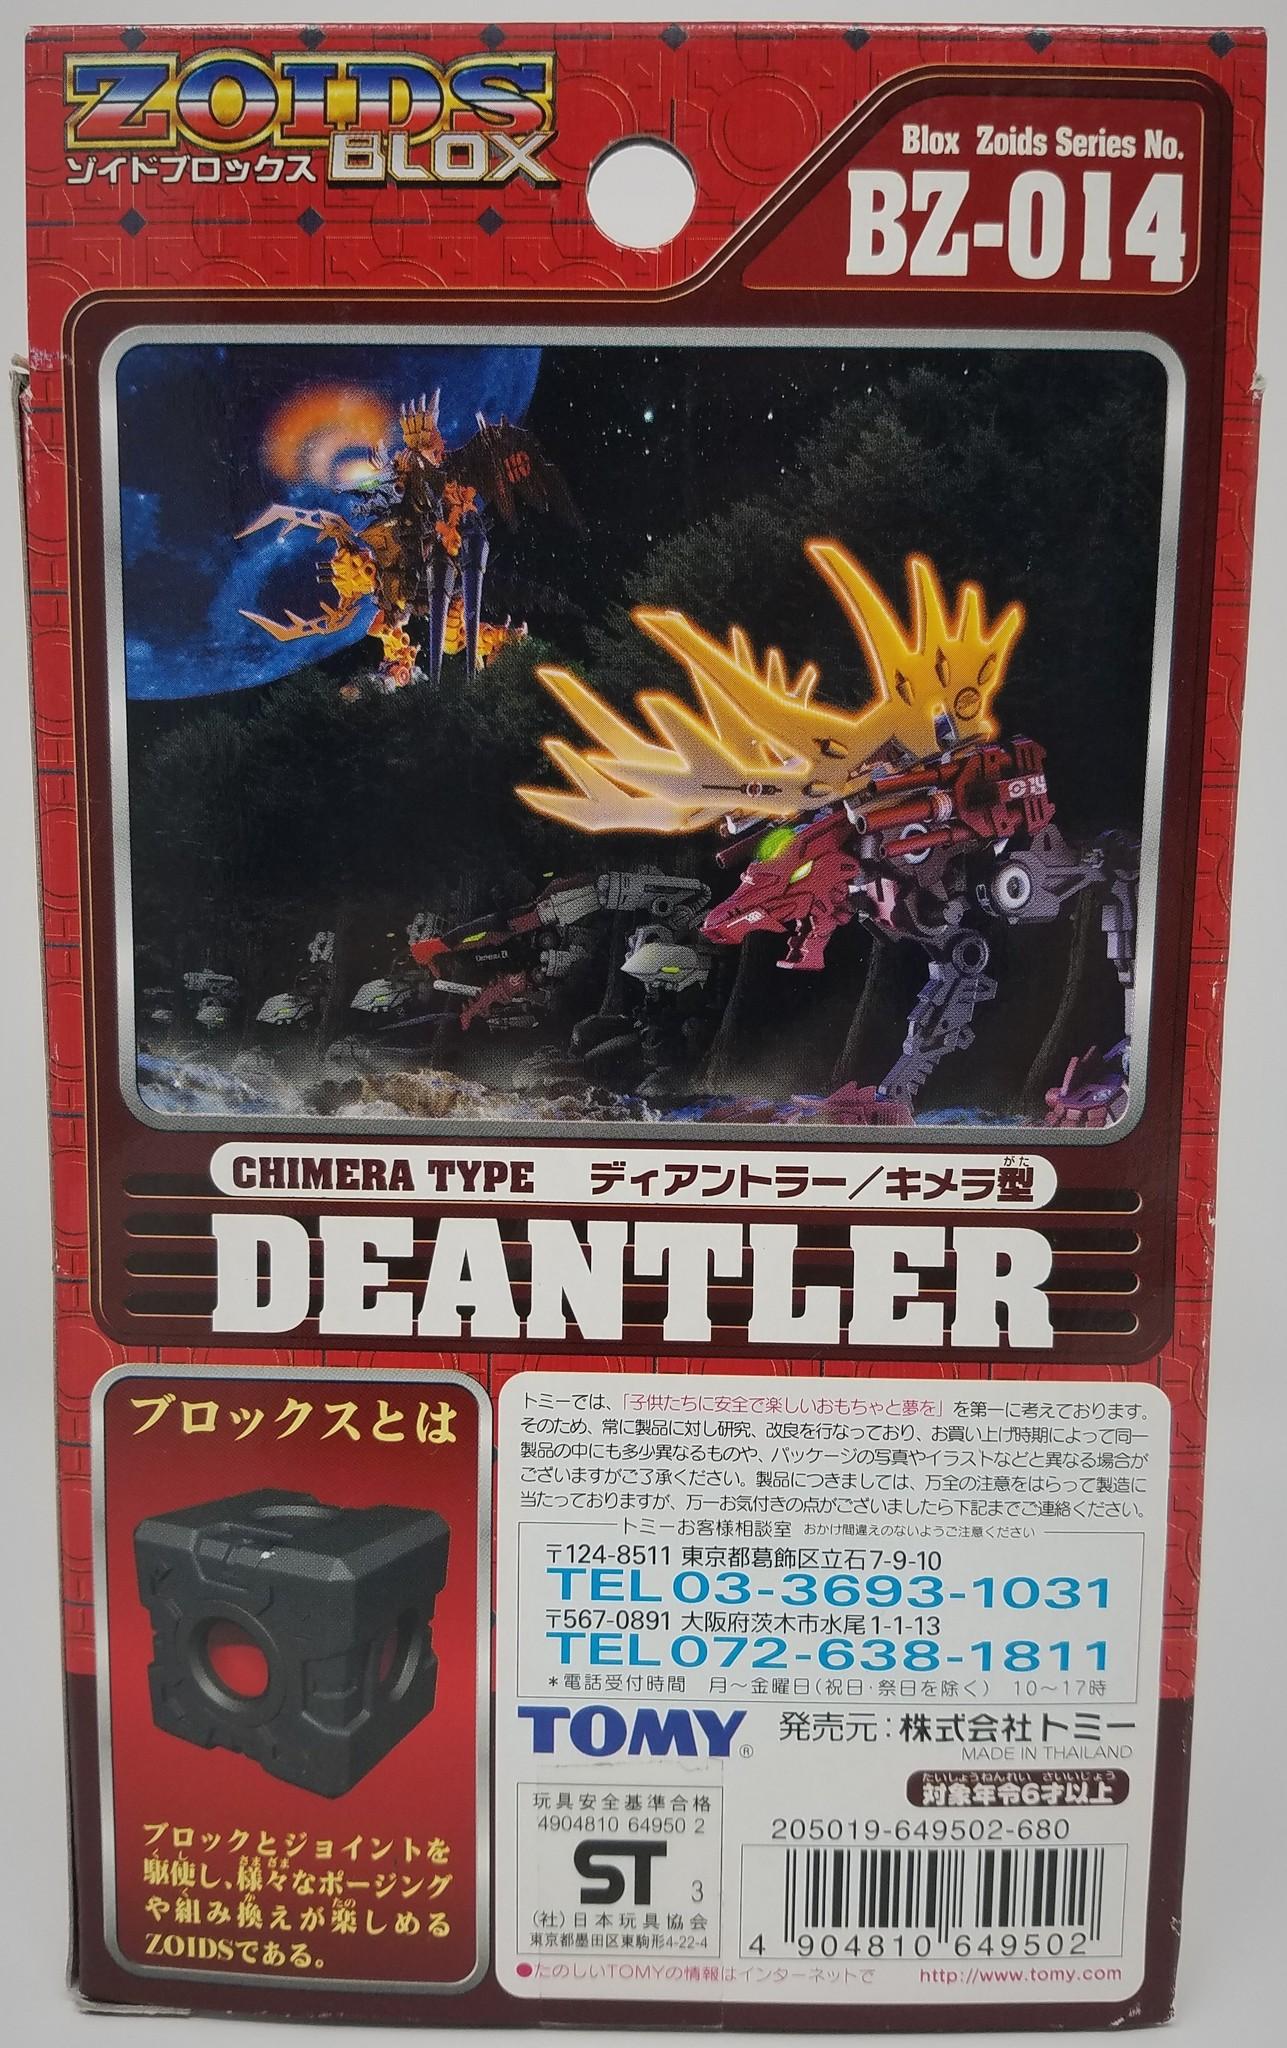 Chimera Type Figure 2003 /> Tomy Zoids Blox BZ-014 Deantler